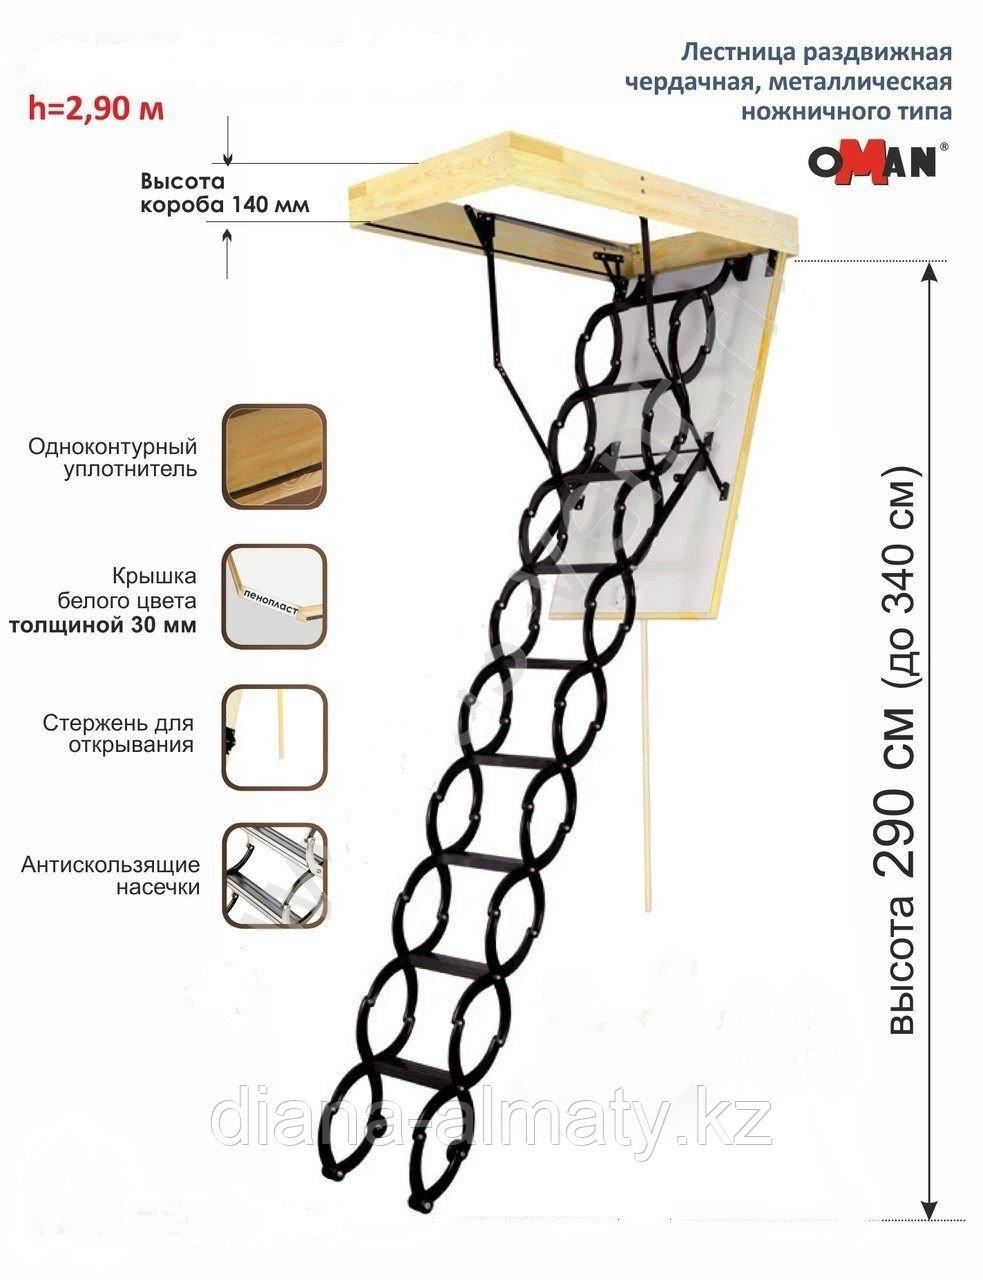 Металлическая чердачная лестница Termo Oman (60х80х290 см) Польша Whats Upp. +7 707 570 5151